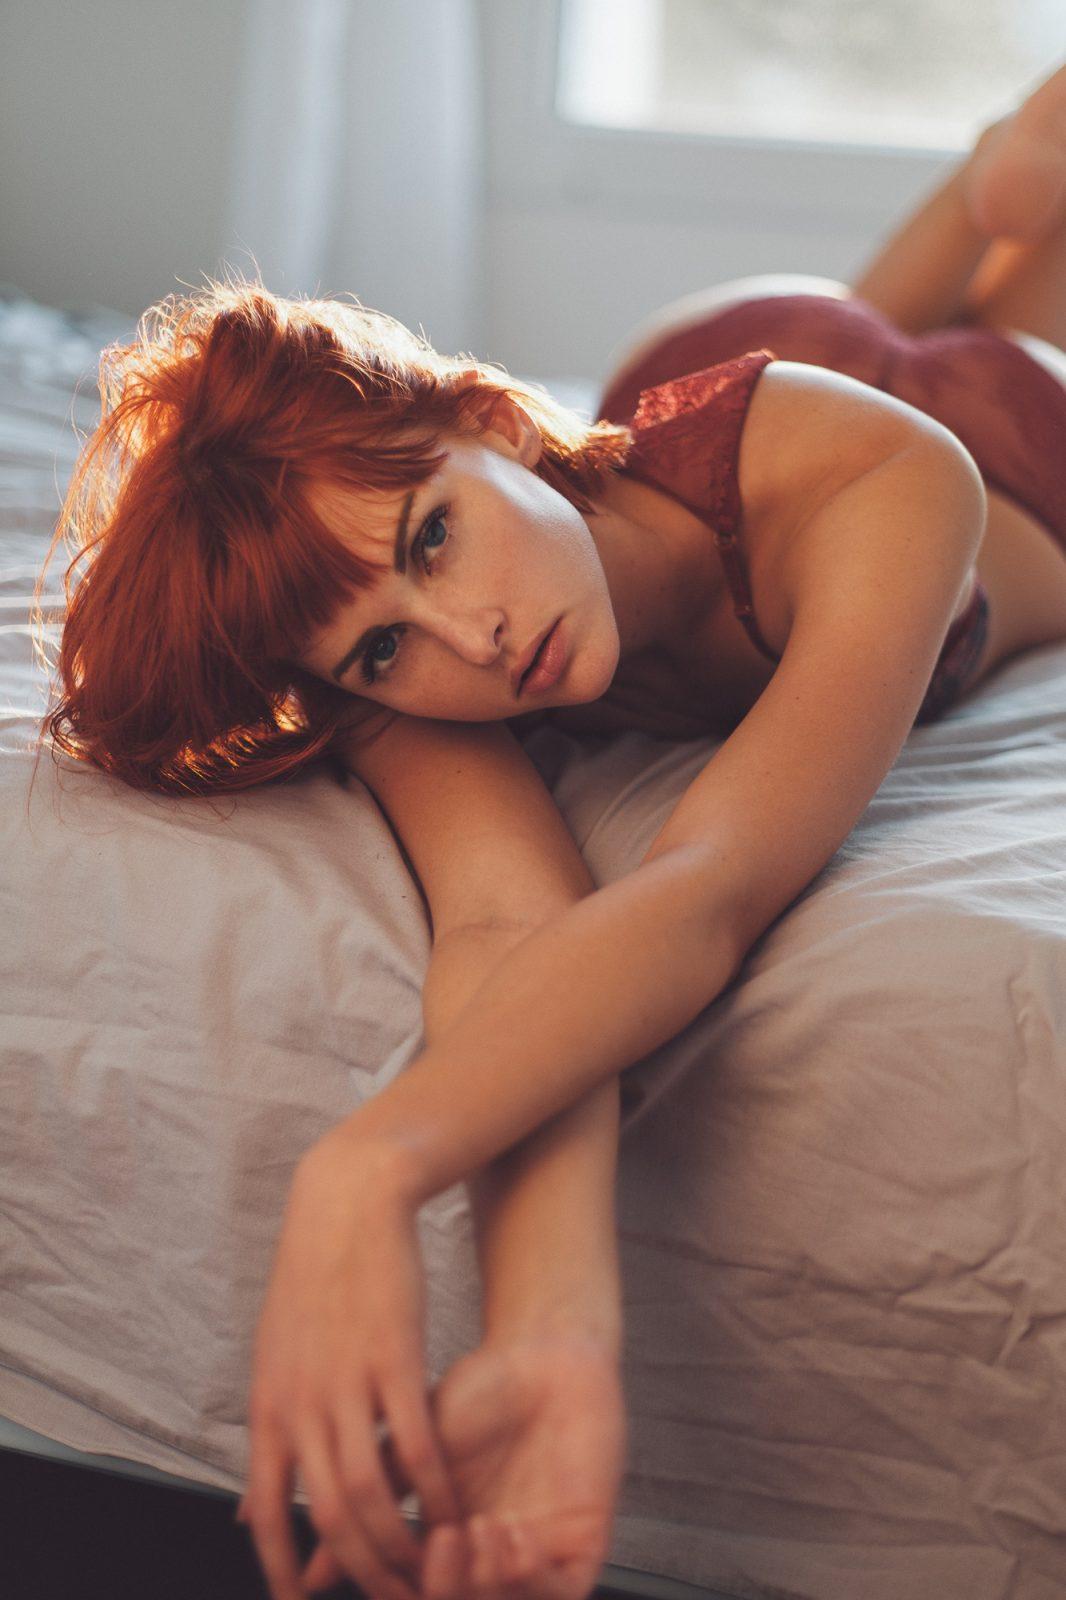 Golden evening Women  Guennadi Ivanov-Kuhn   // lionsmag.com - premium nude photography magazine